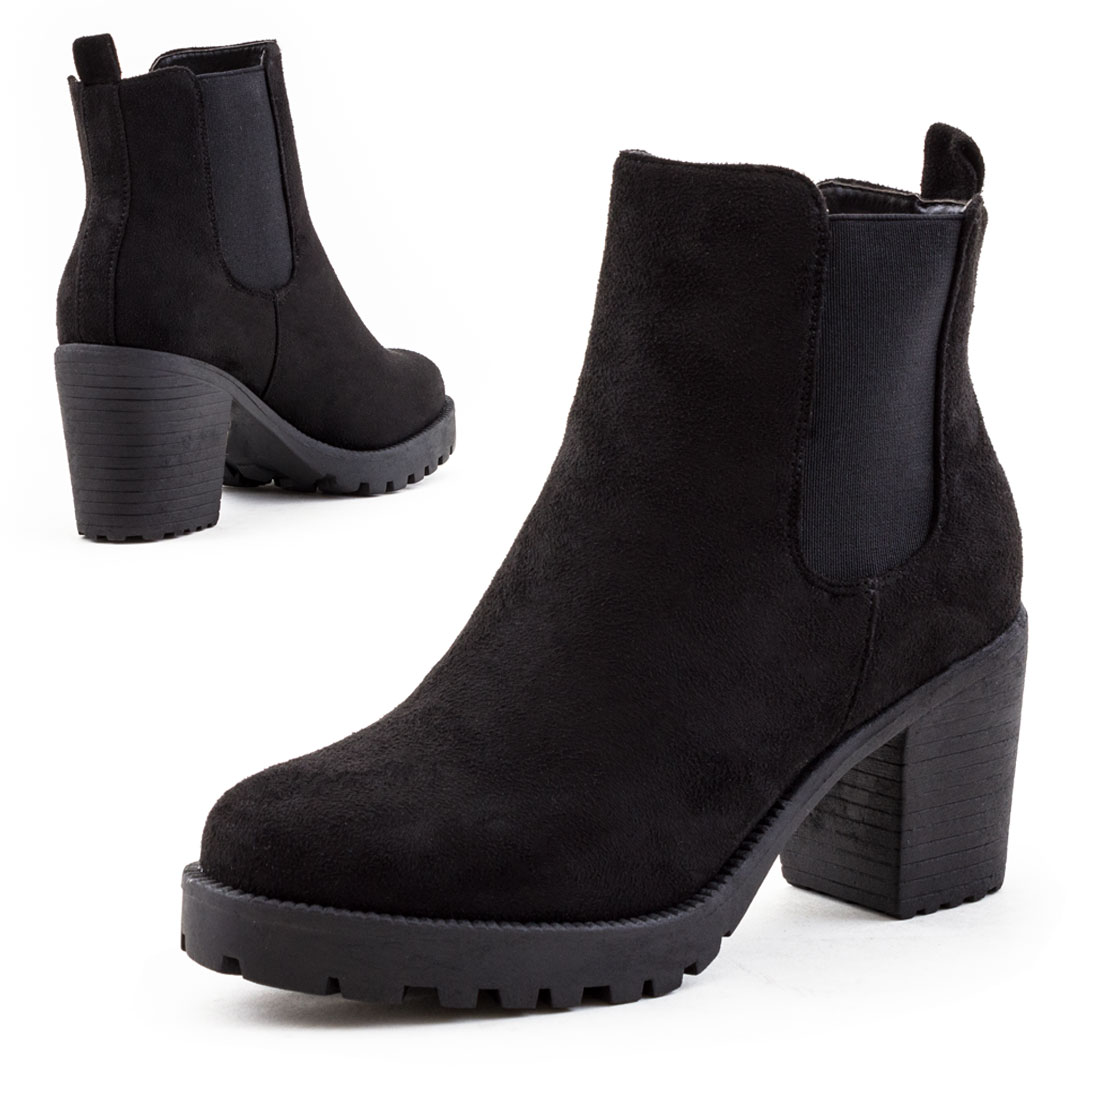 neu damen blockabsatz ankle boots blockabsatz schuhe gr 36. Black Bedroom Furniture Sets. Home Design Ideas